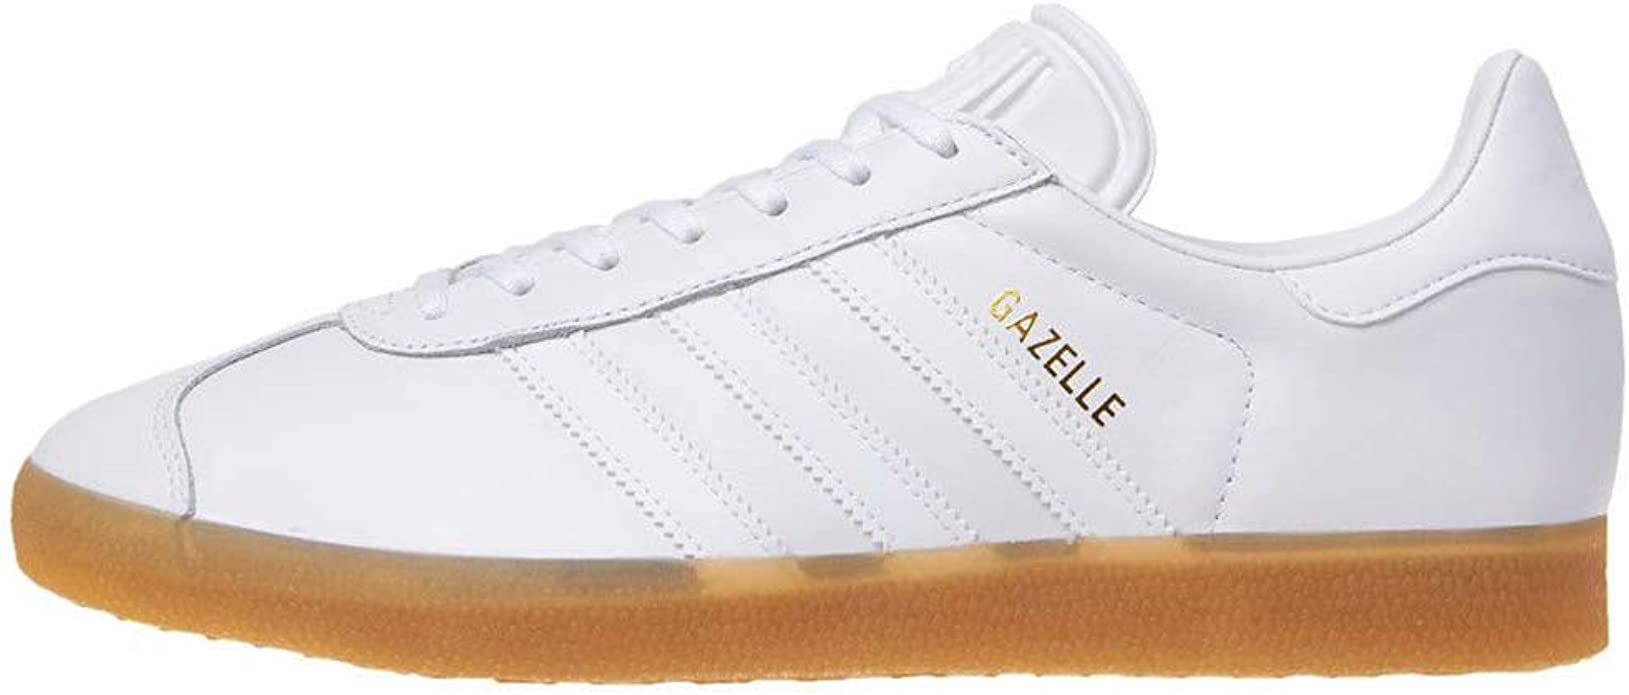 adidas gazelle blanche et or